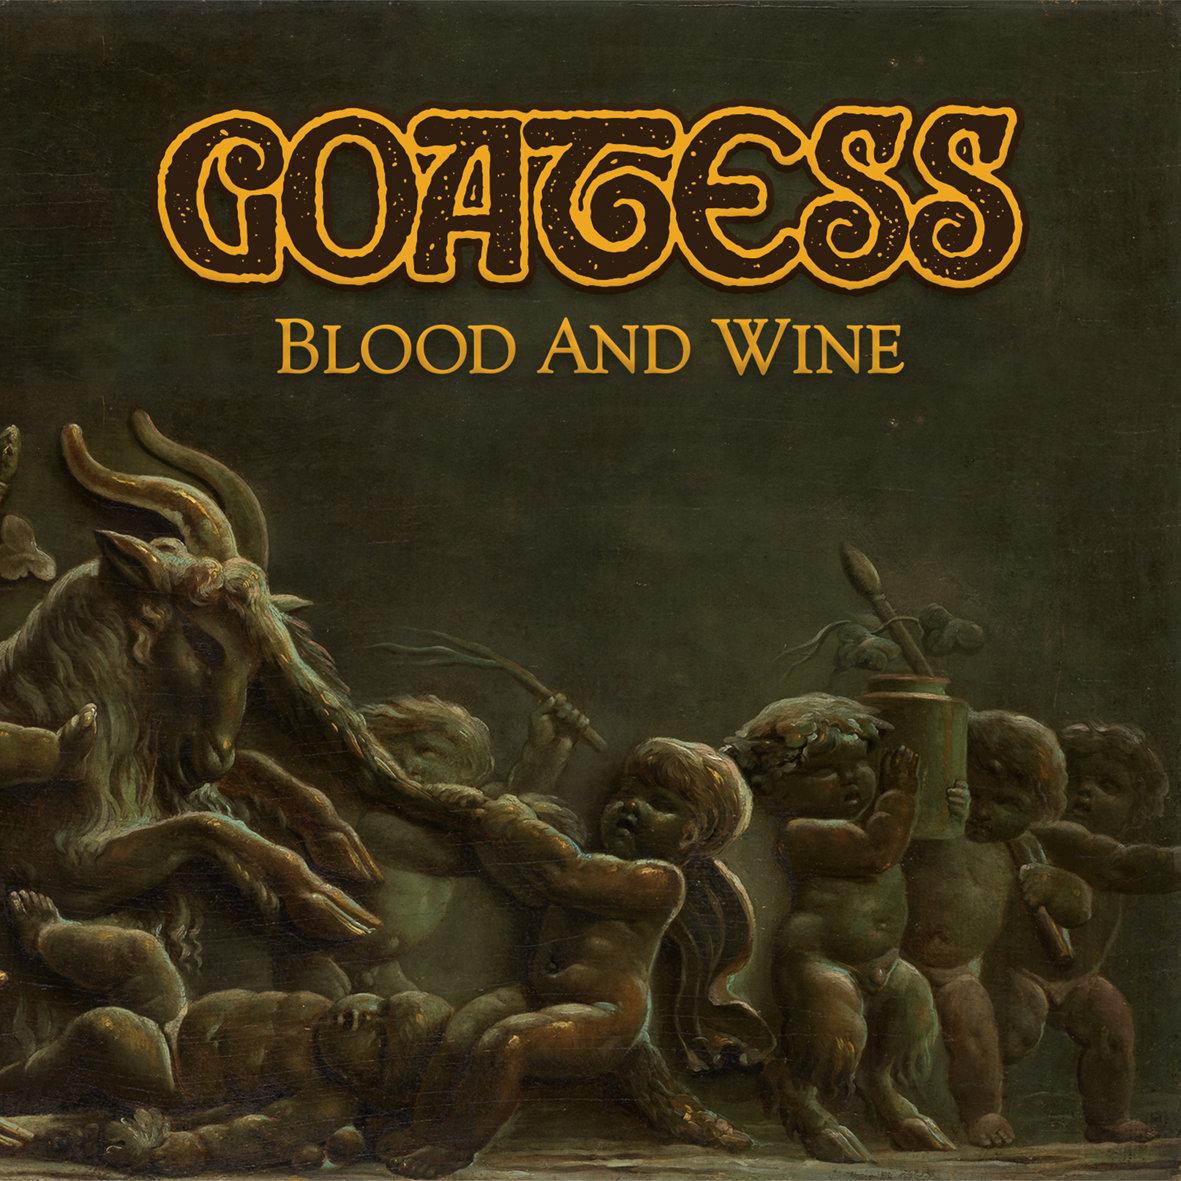 Goatess Blood and Wine